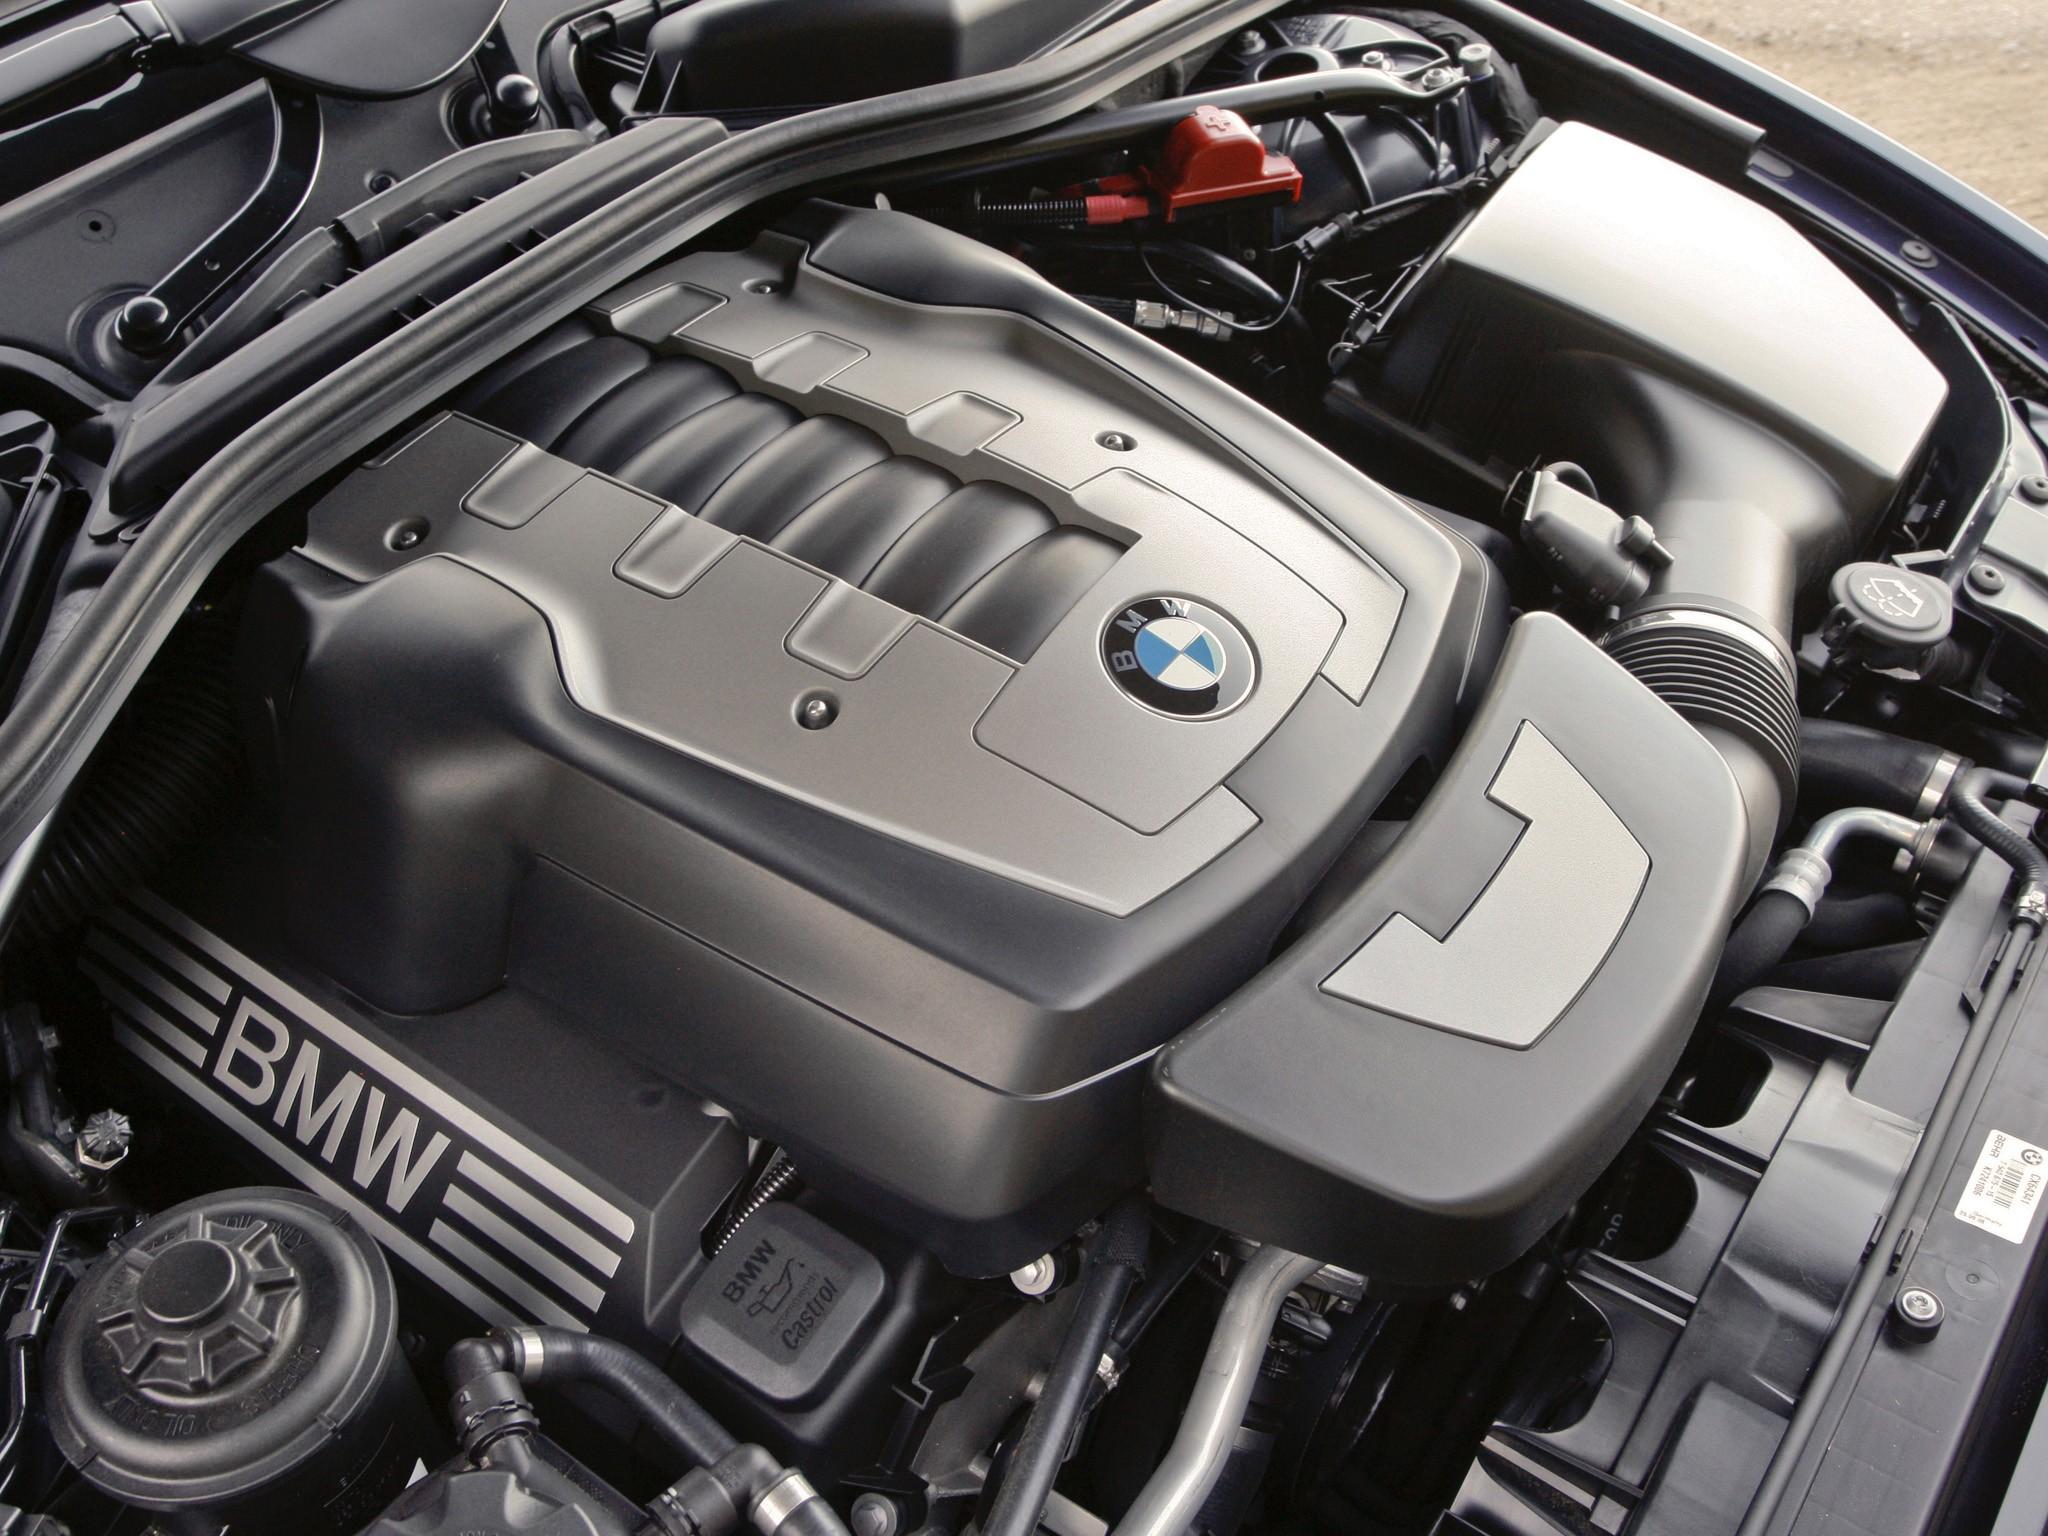 2008 bmw 650i convertible engine